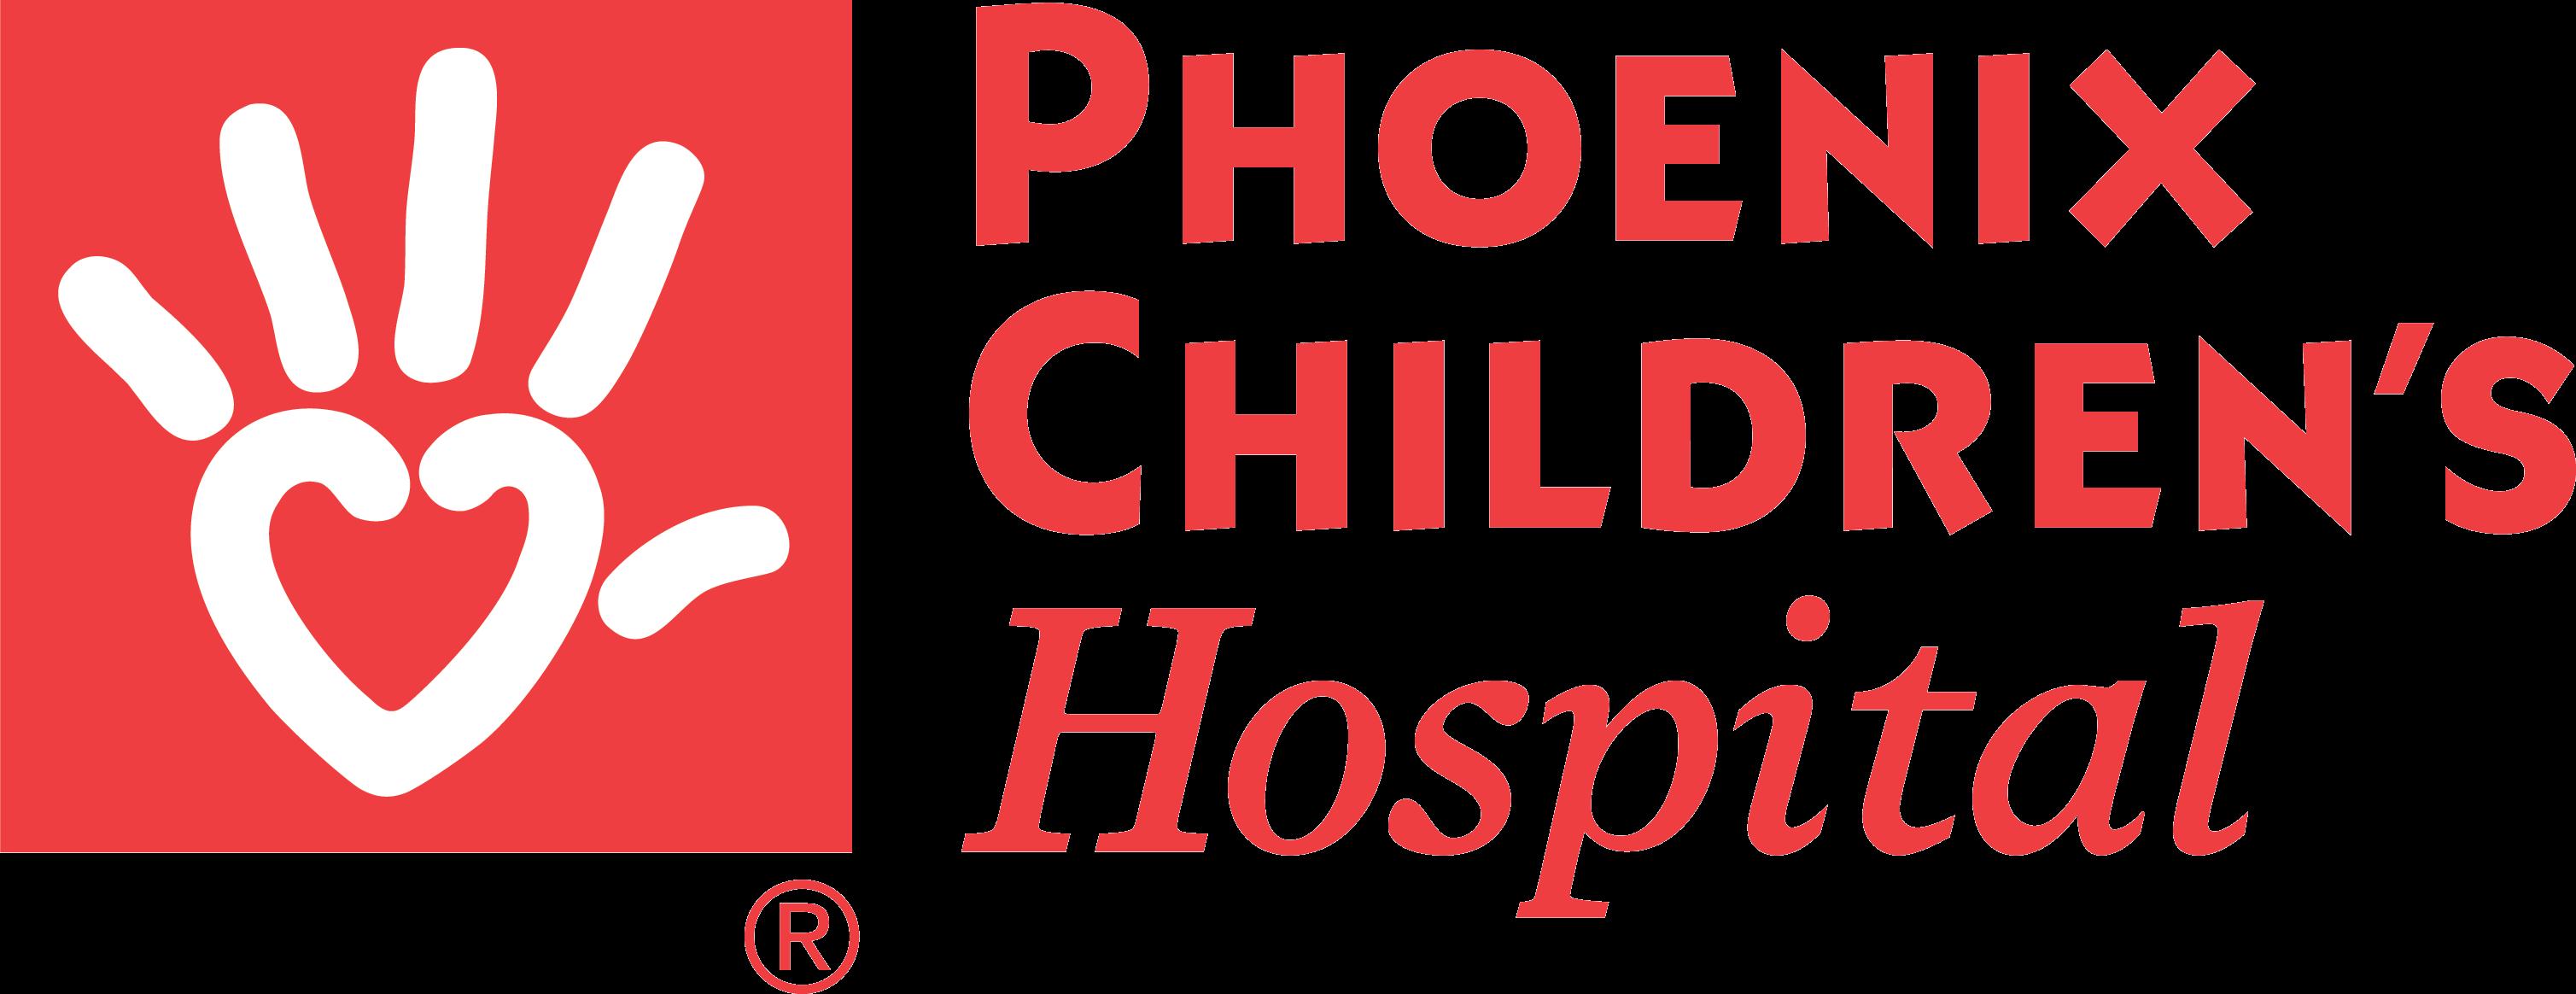 pc-phoenix-childrens-hosp-logo